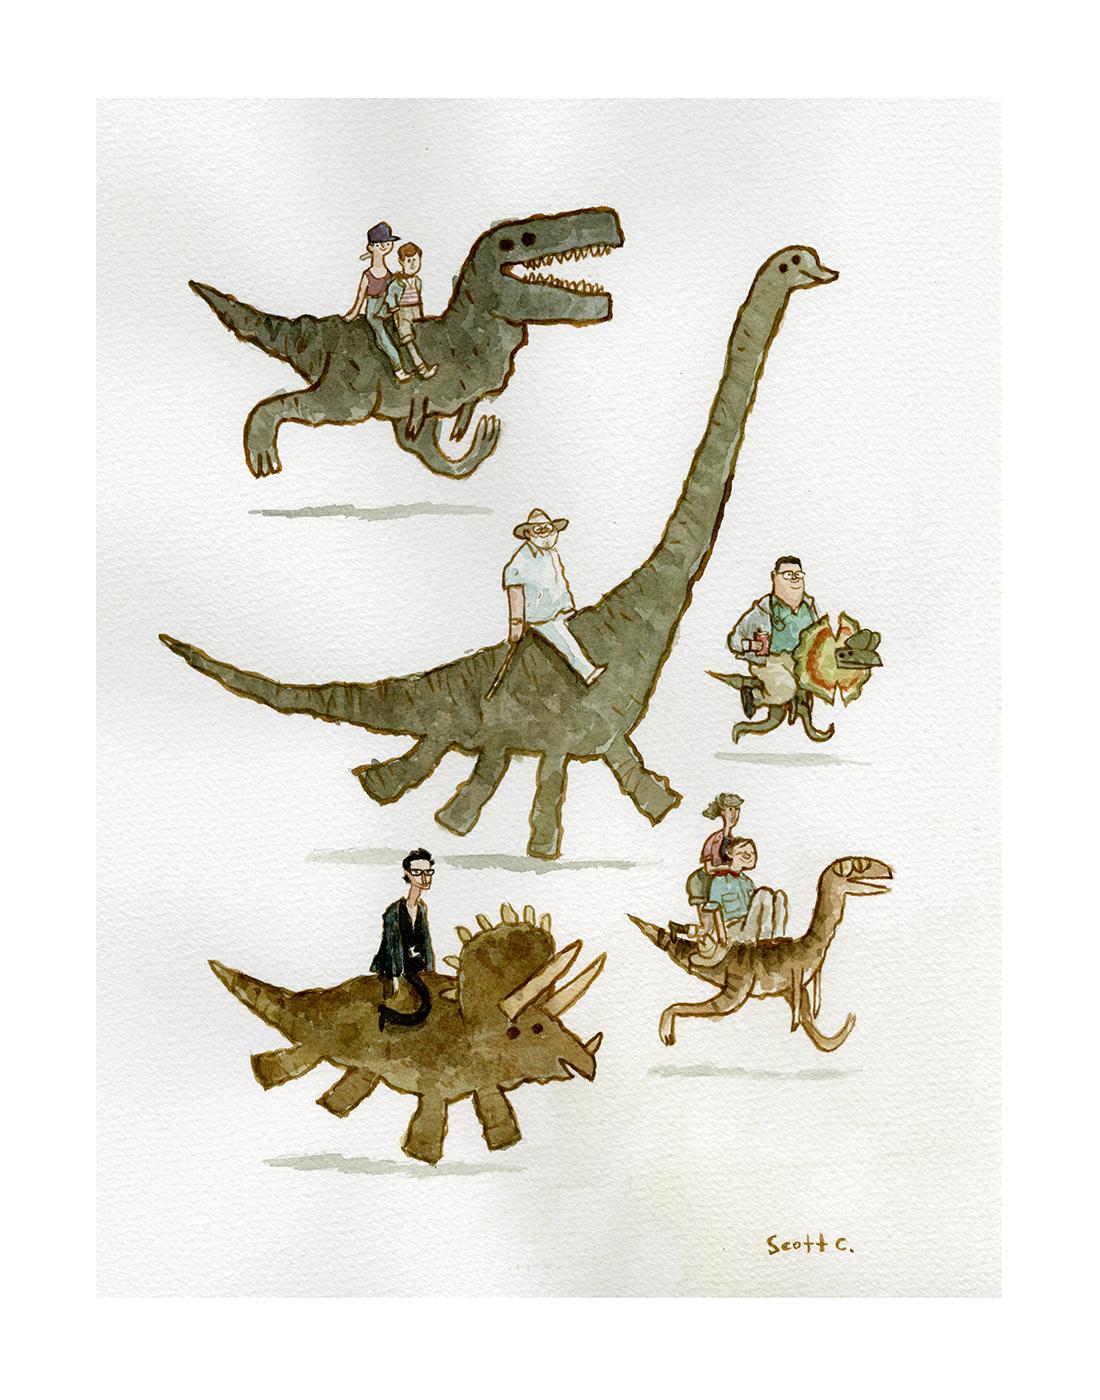 2. Jurassic Backs print – $30